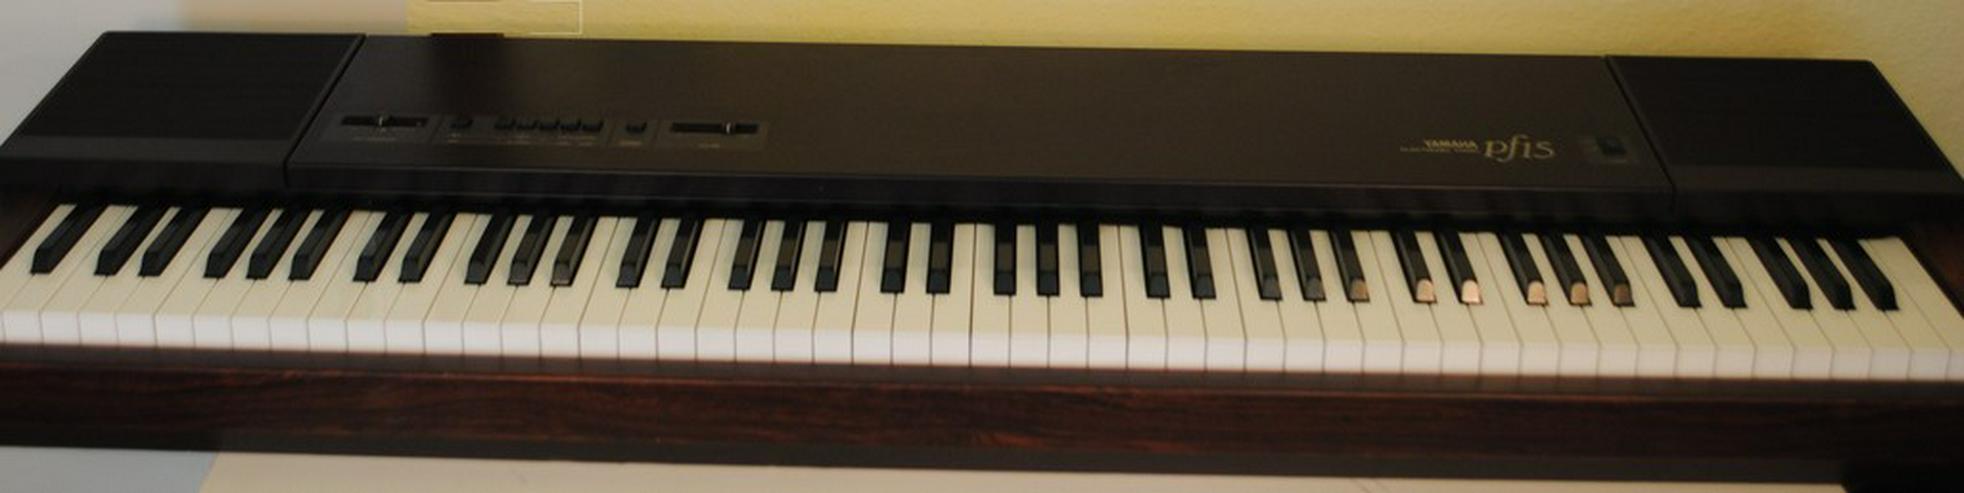 Bild 2: E- Klavier Yamaha PF-15